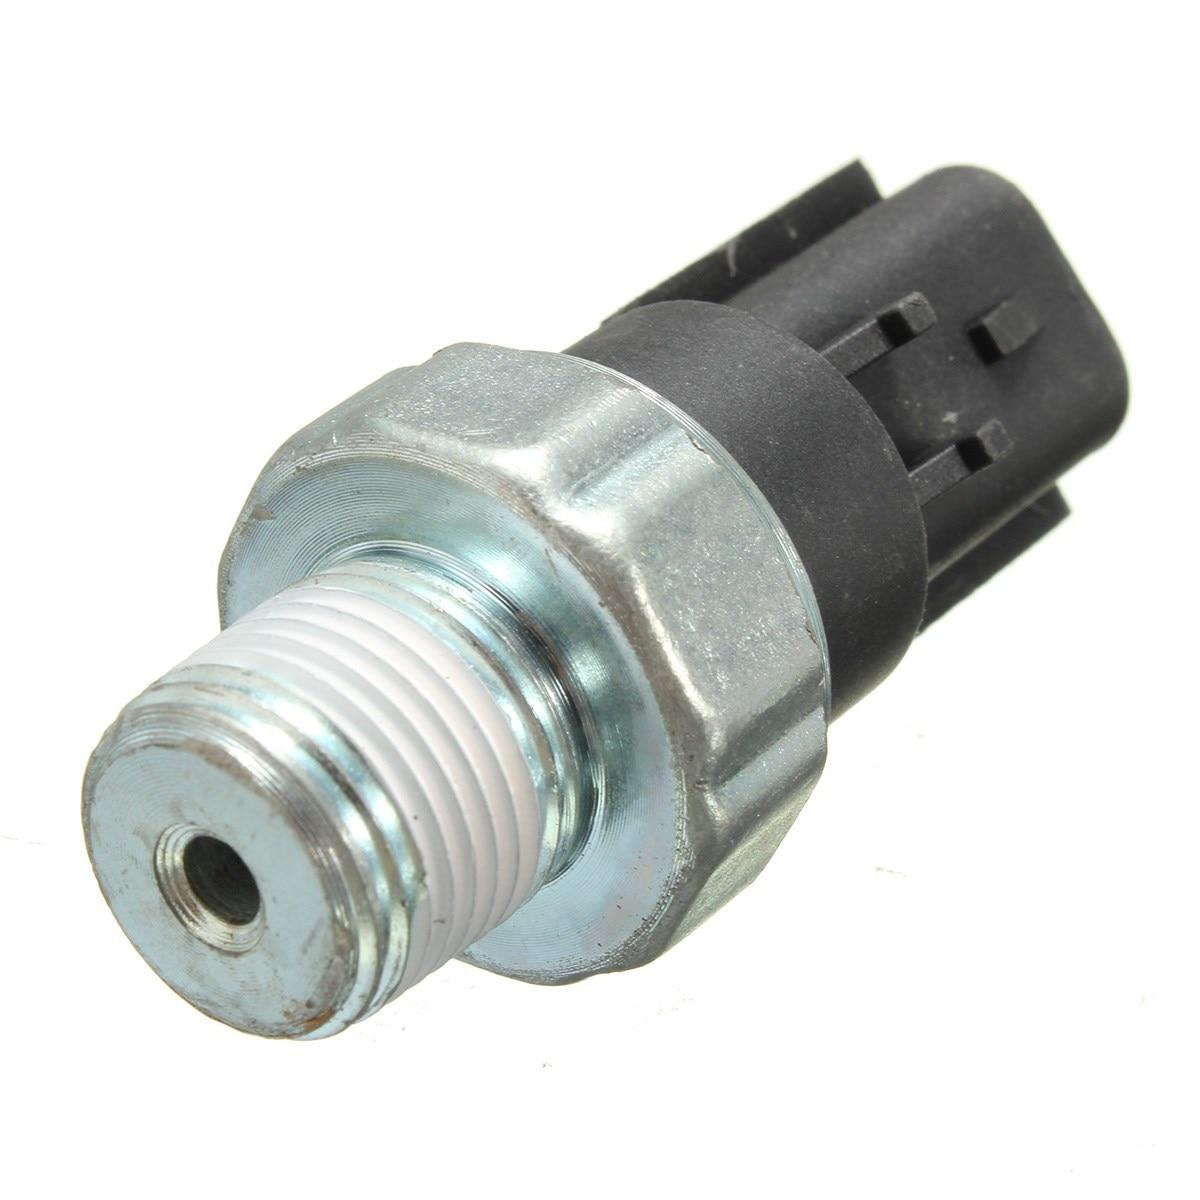 Car auto engine oil pressure sensor switch for chrysler dodge jeep ps287